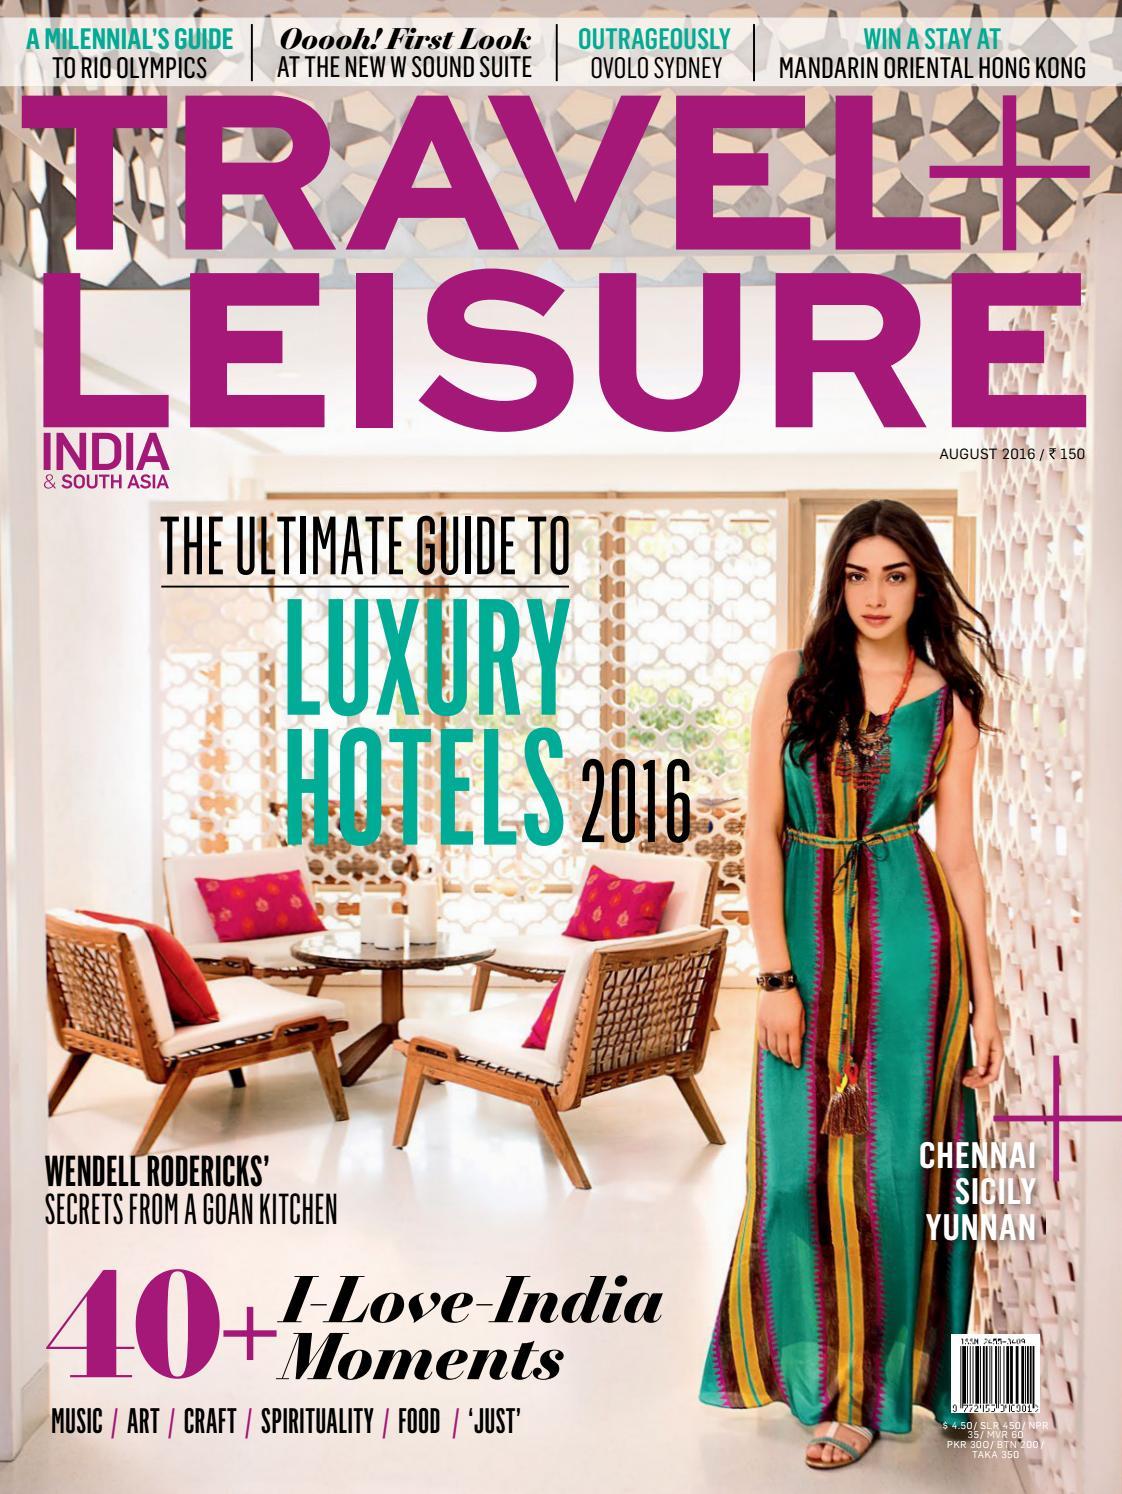 Travel leisure India